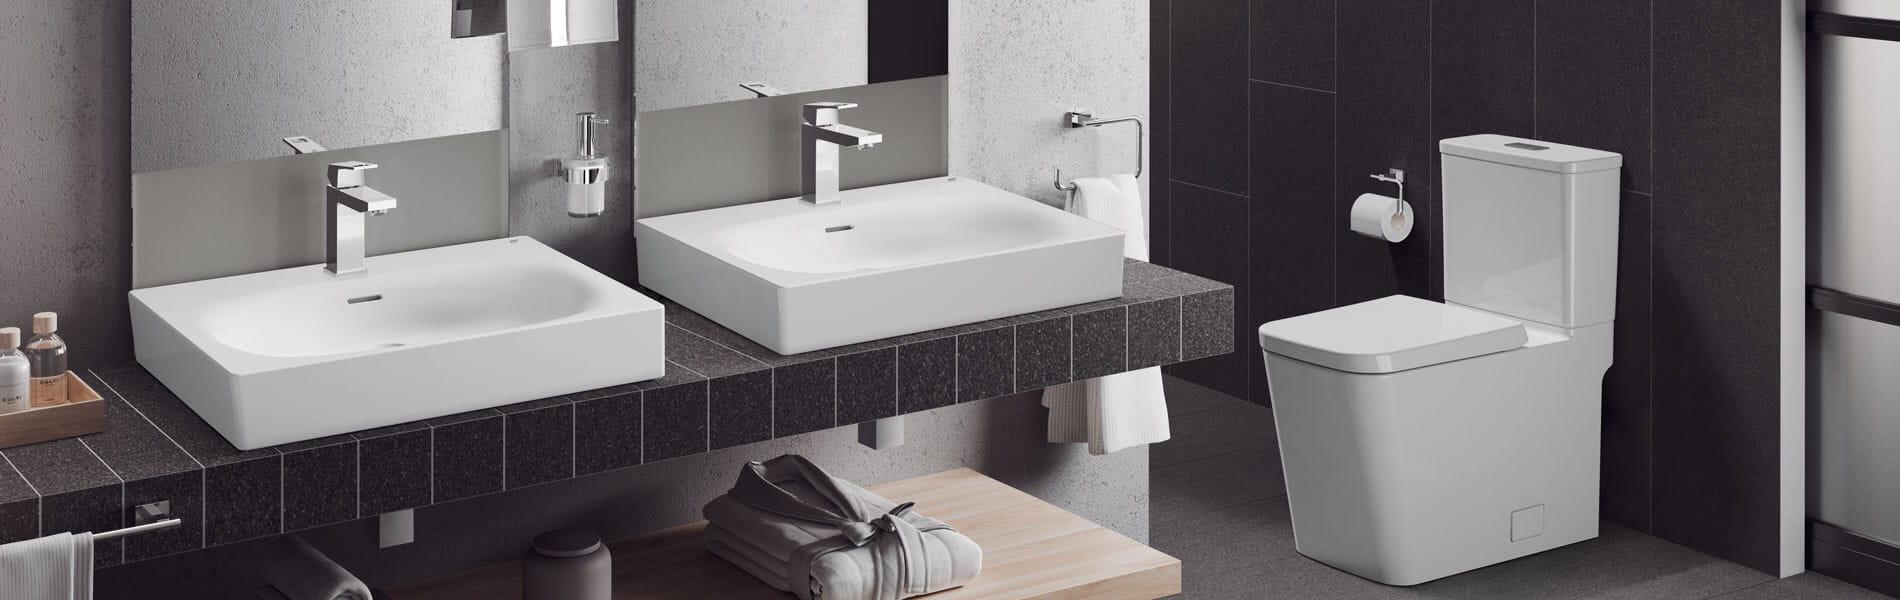 GROHE Sinks